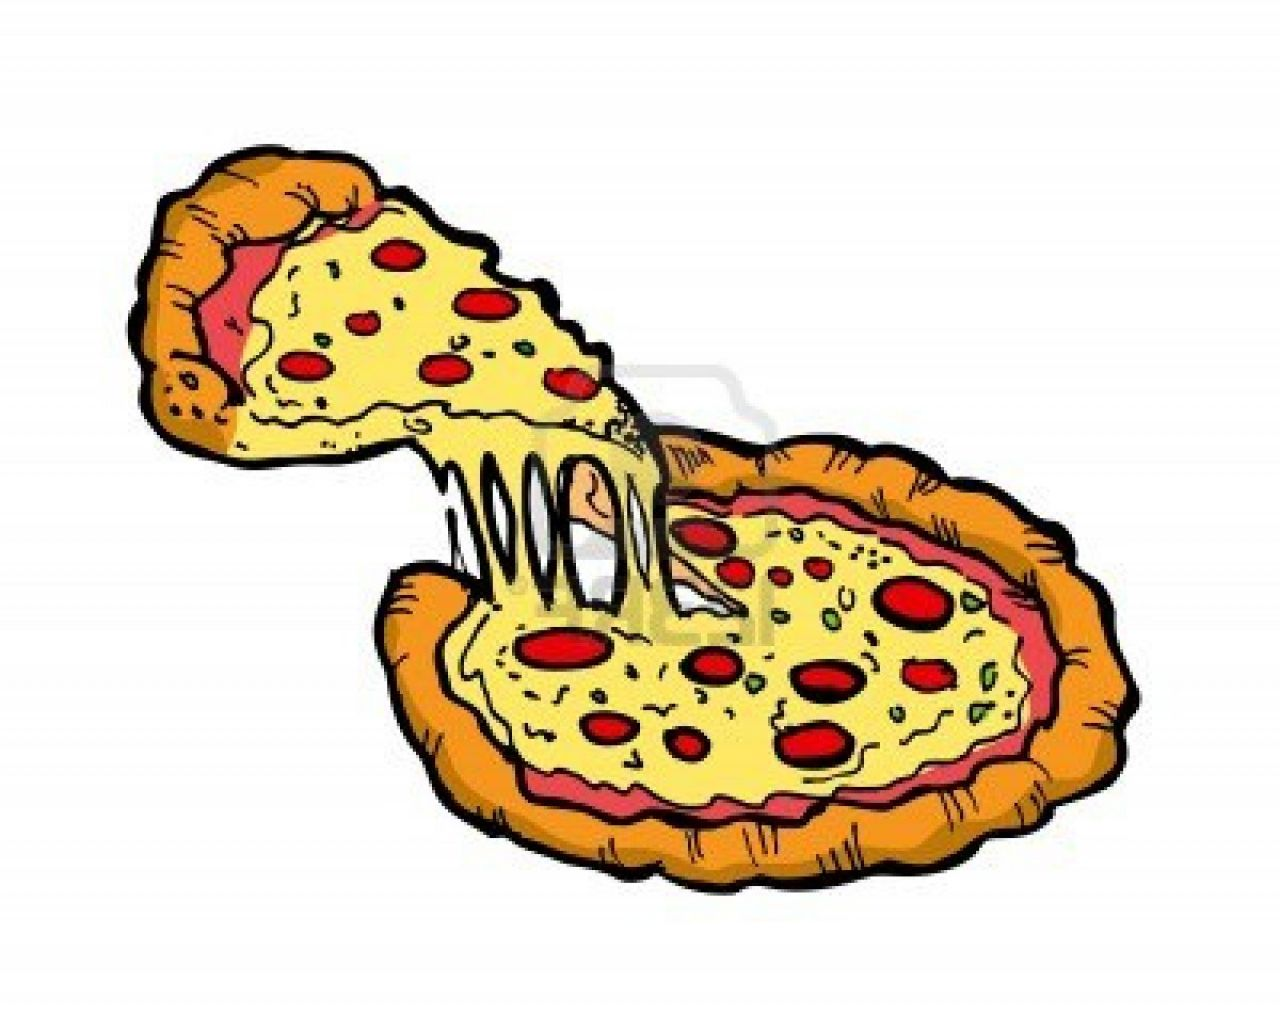 Free panda images pizzaclipart. Pizza clipart